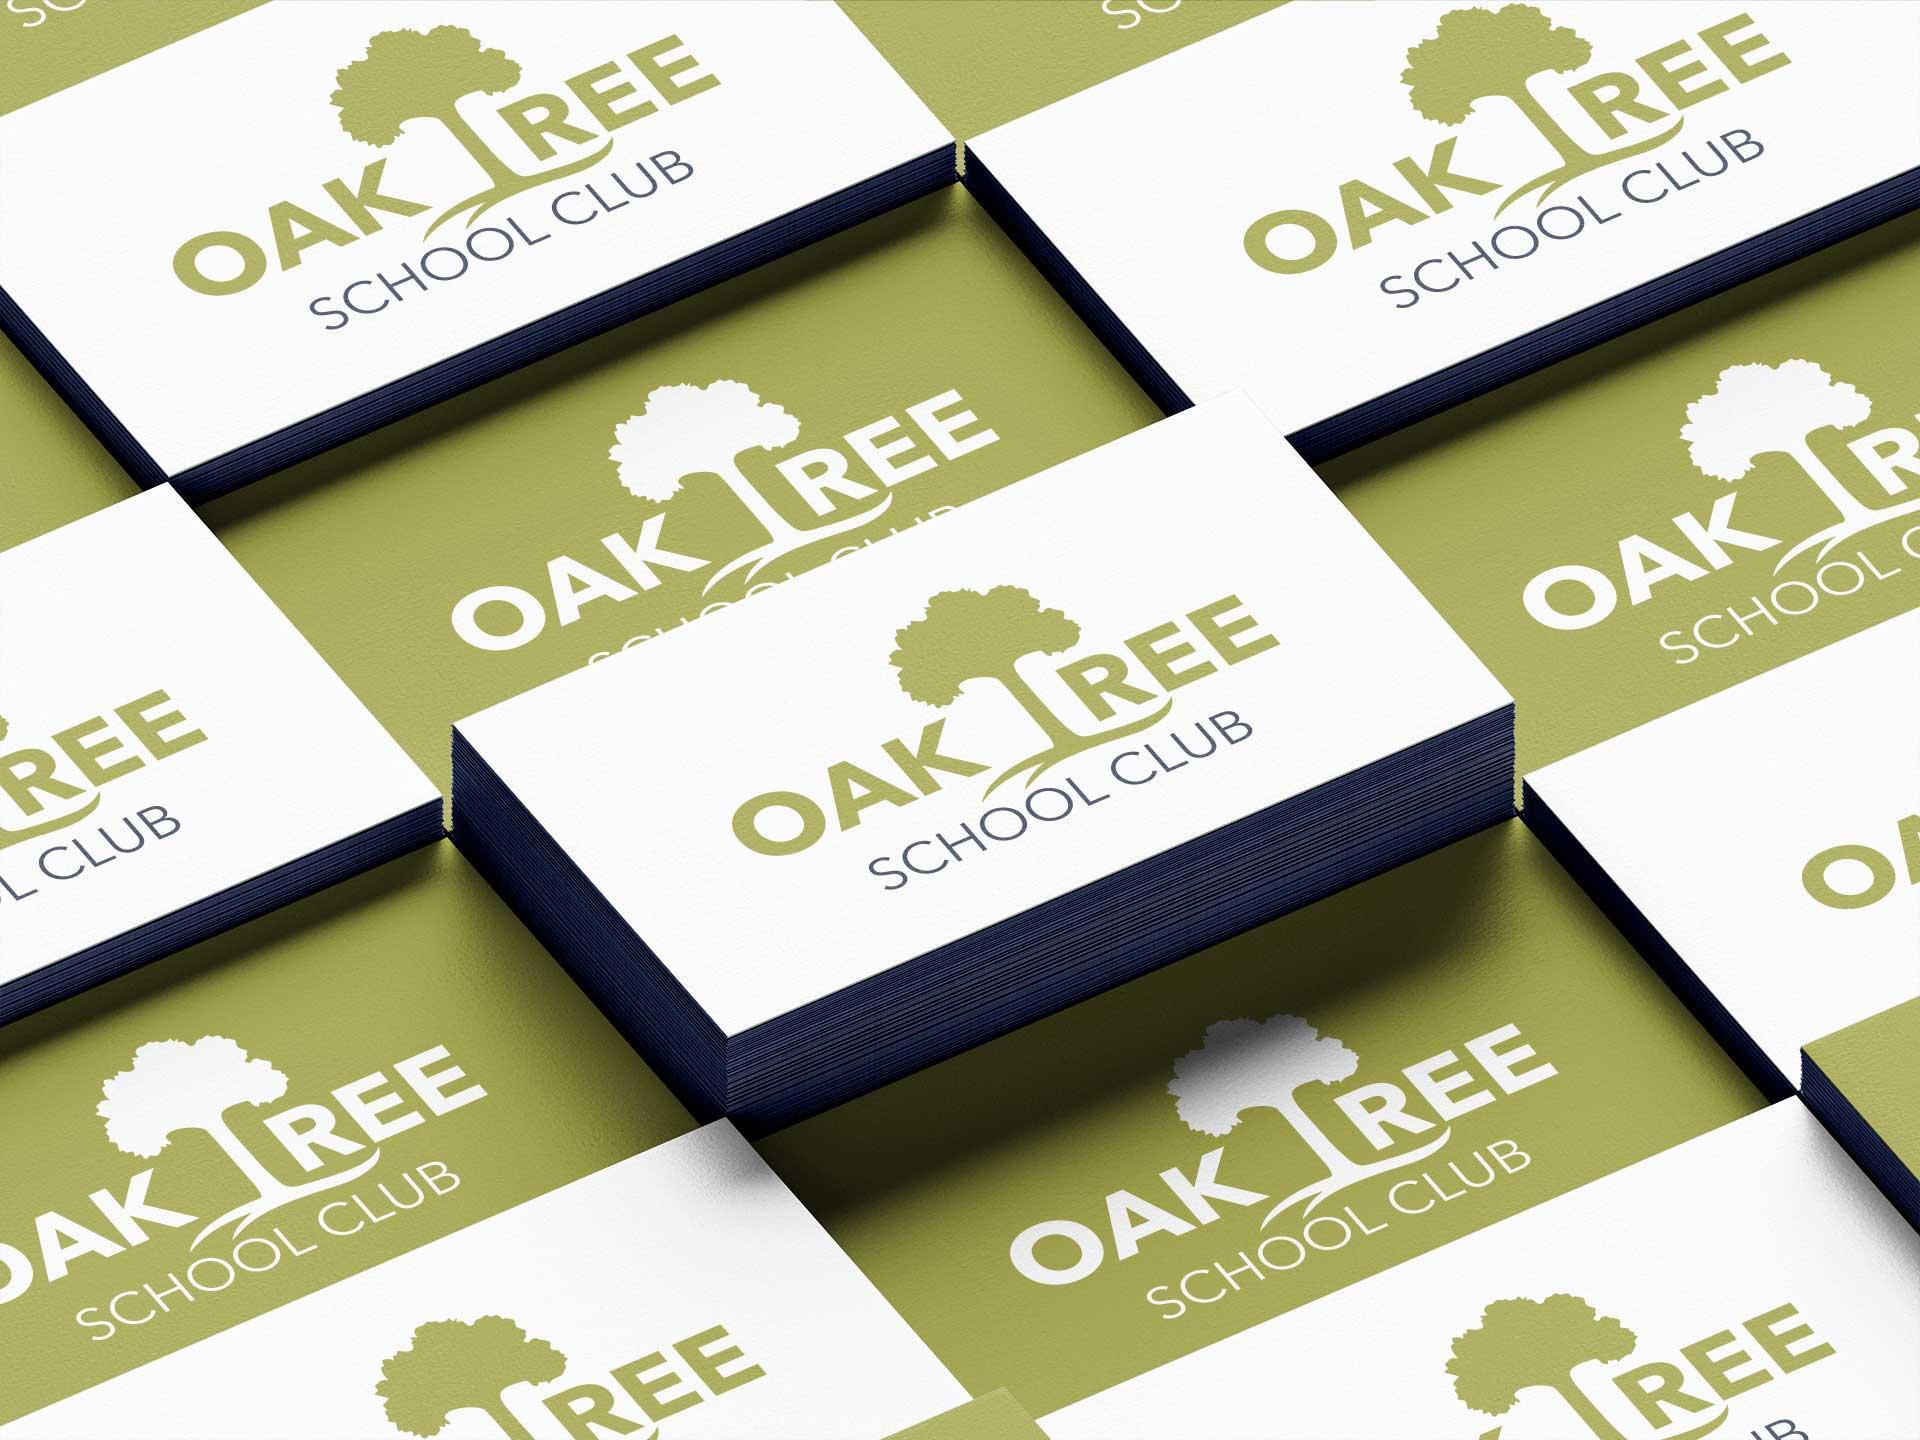 Oak Tree School Club Cards